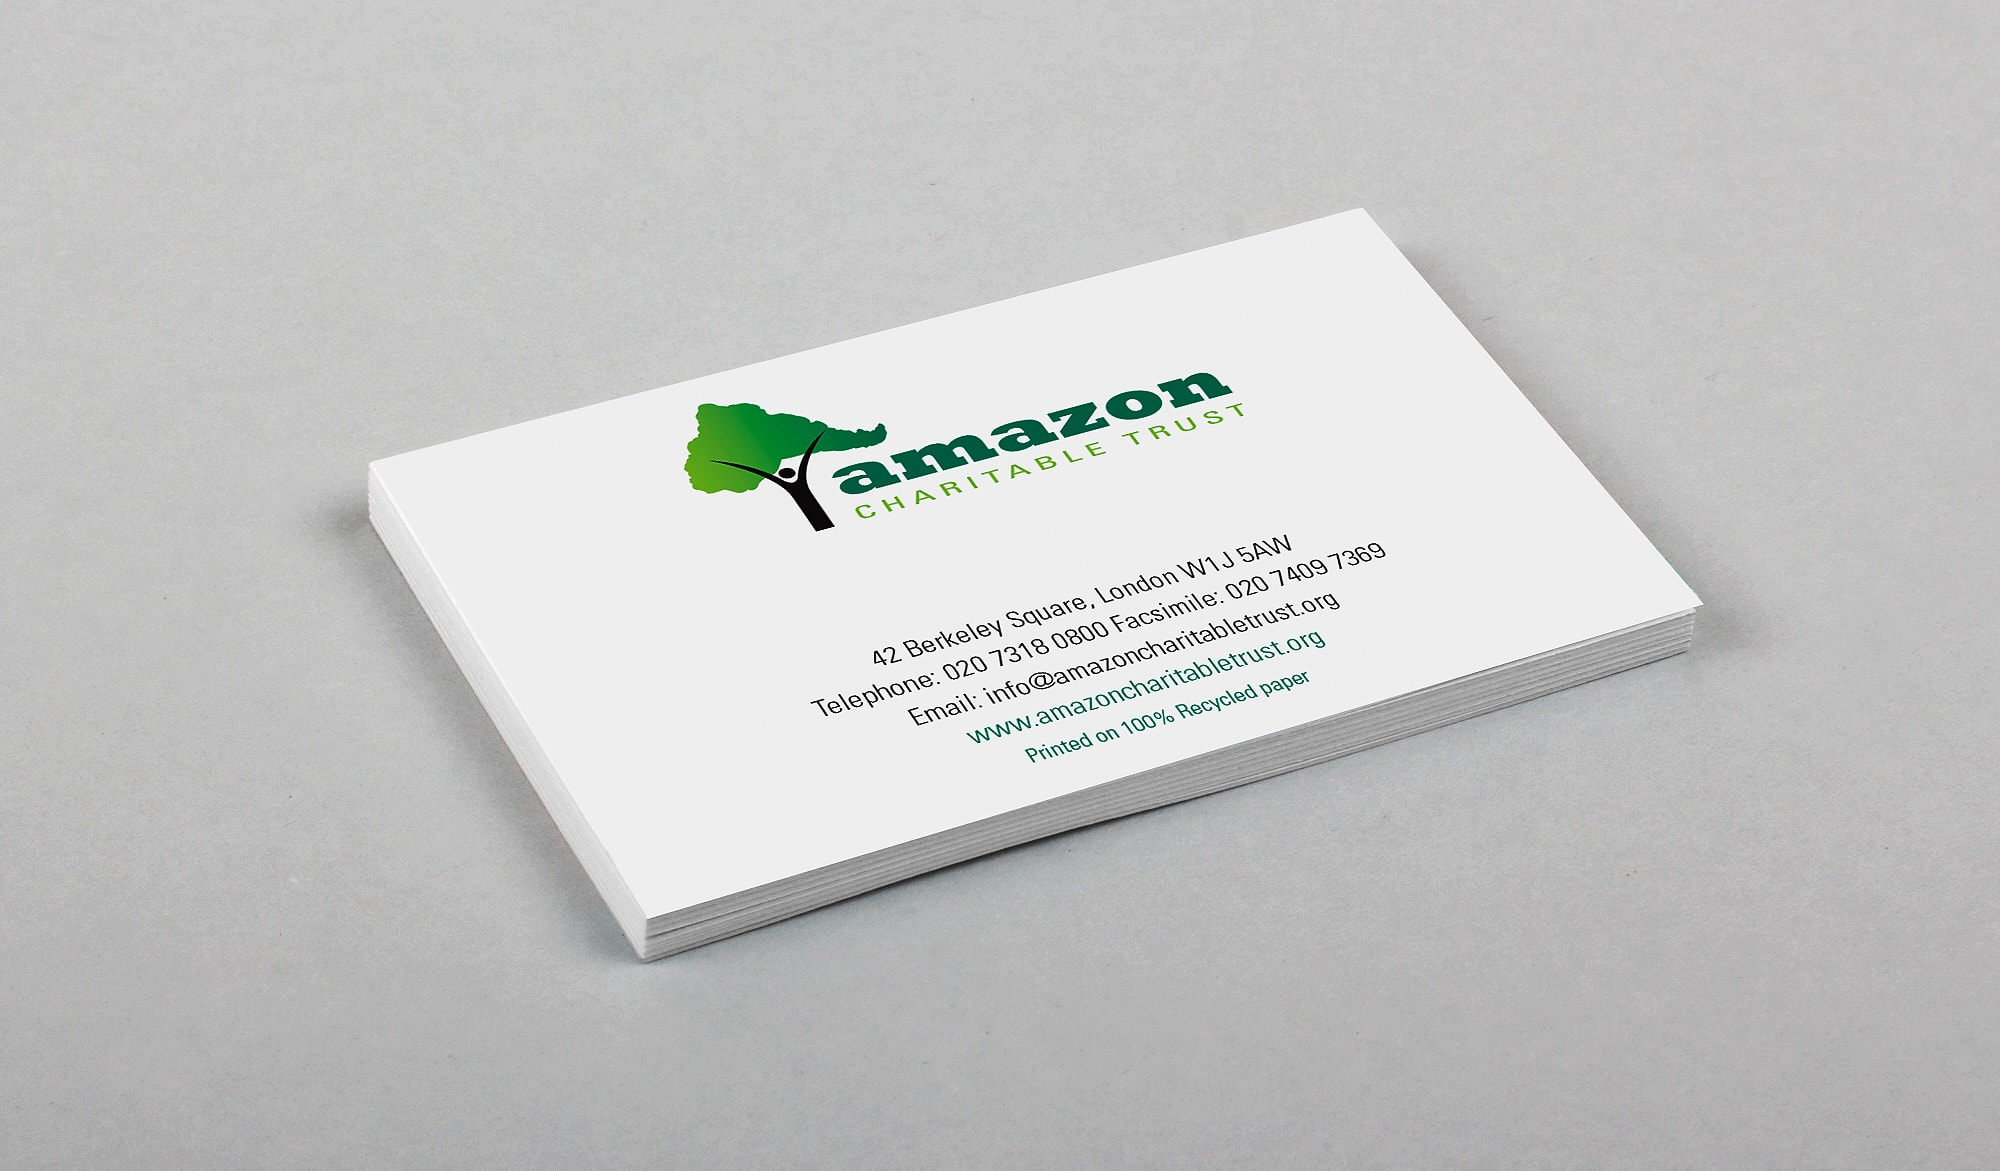 Amazon Charitable Trust - cards